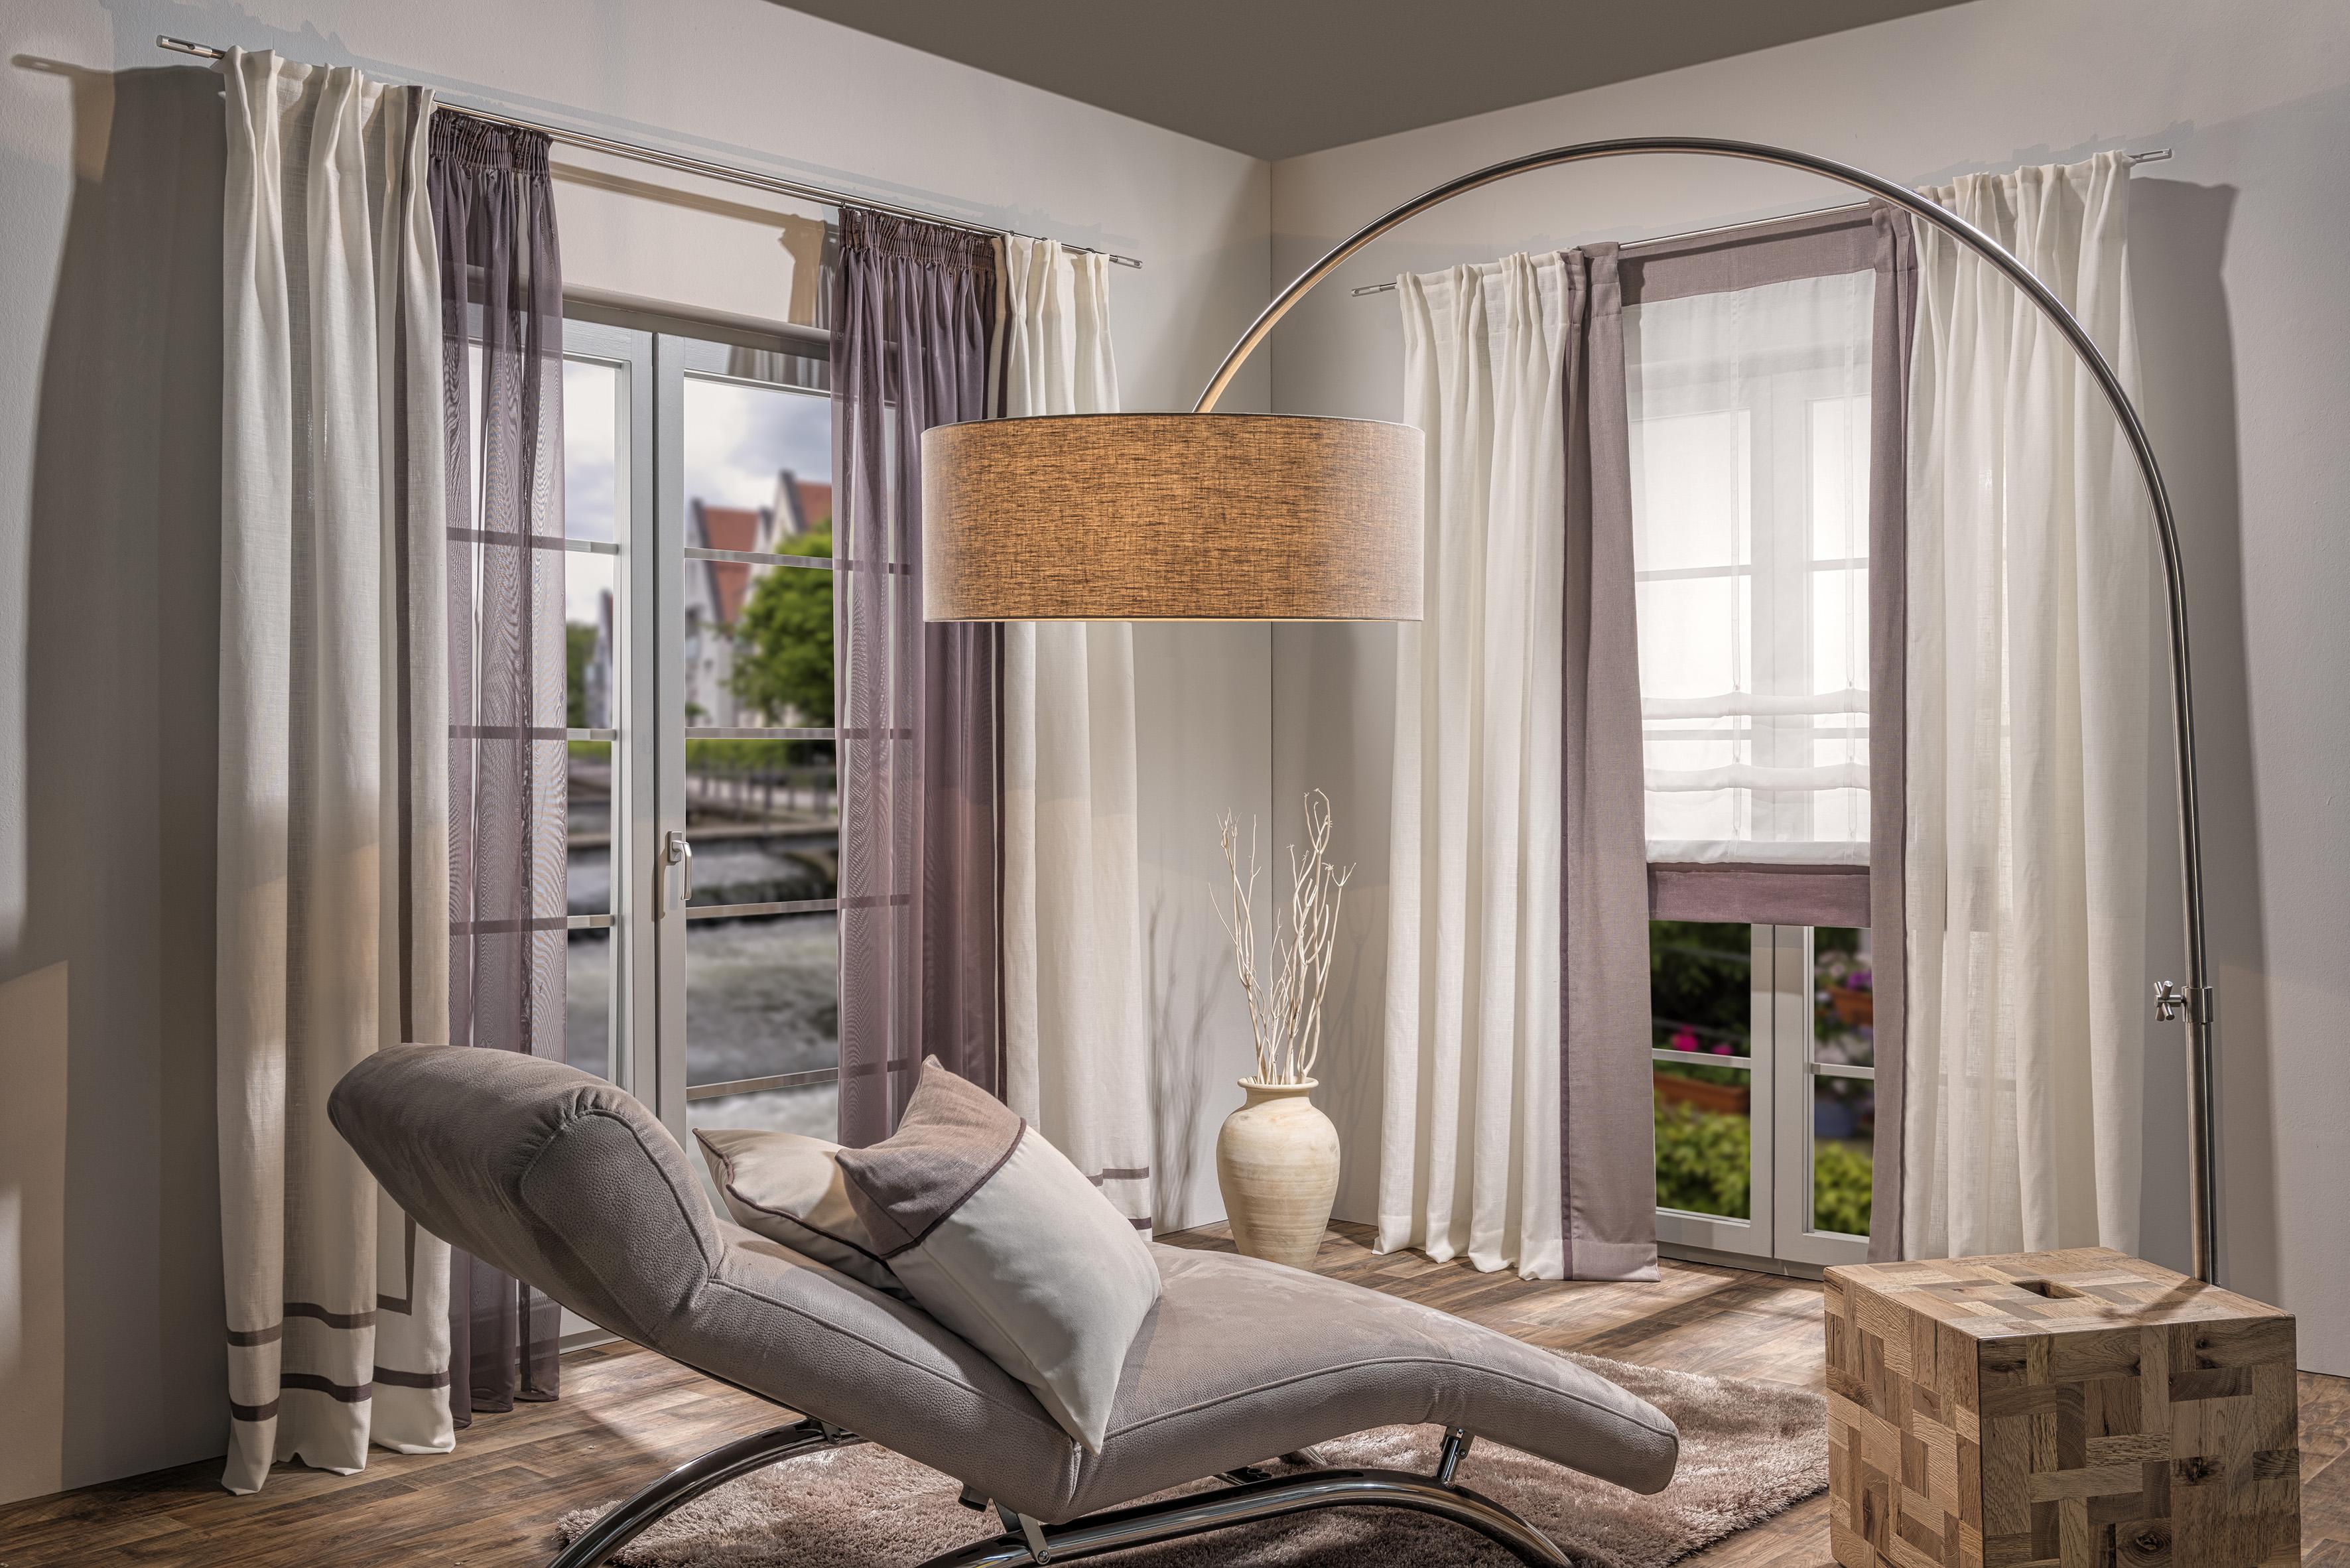 Fensterplatz Harrislee – Plissees Rollos Jalousien oder